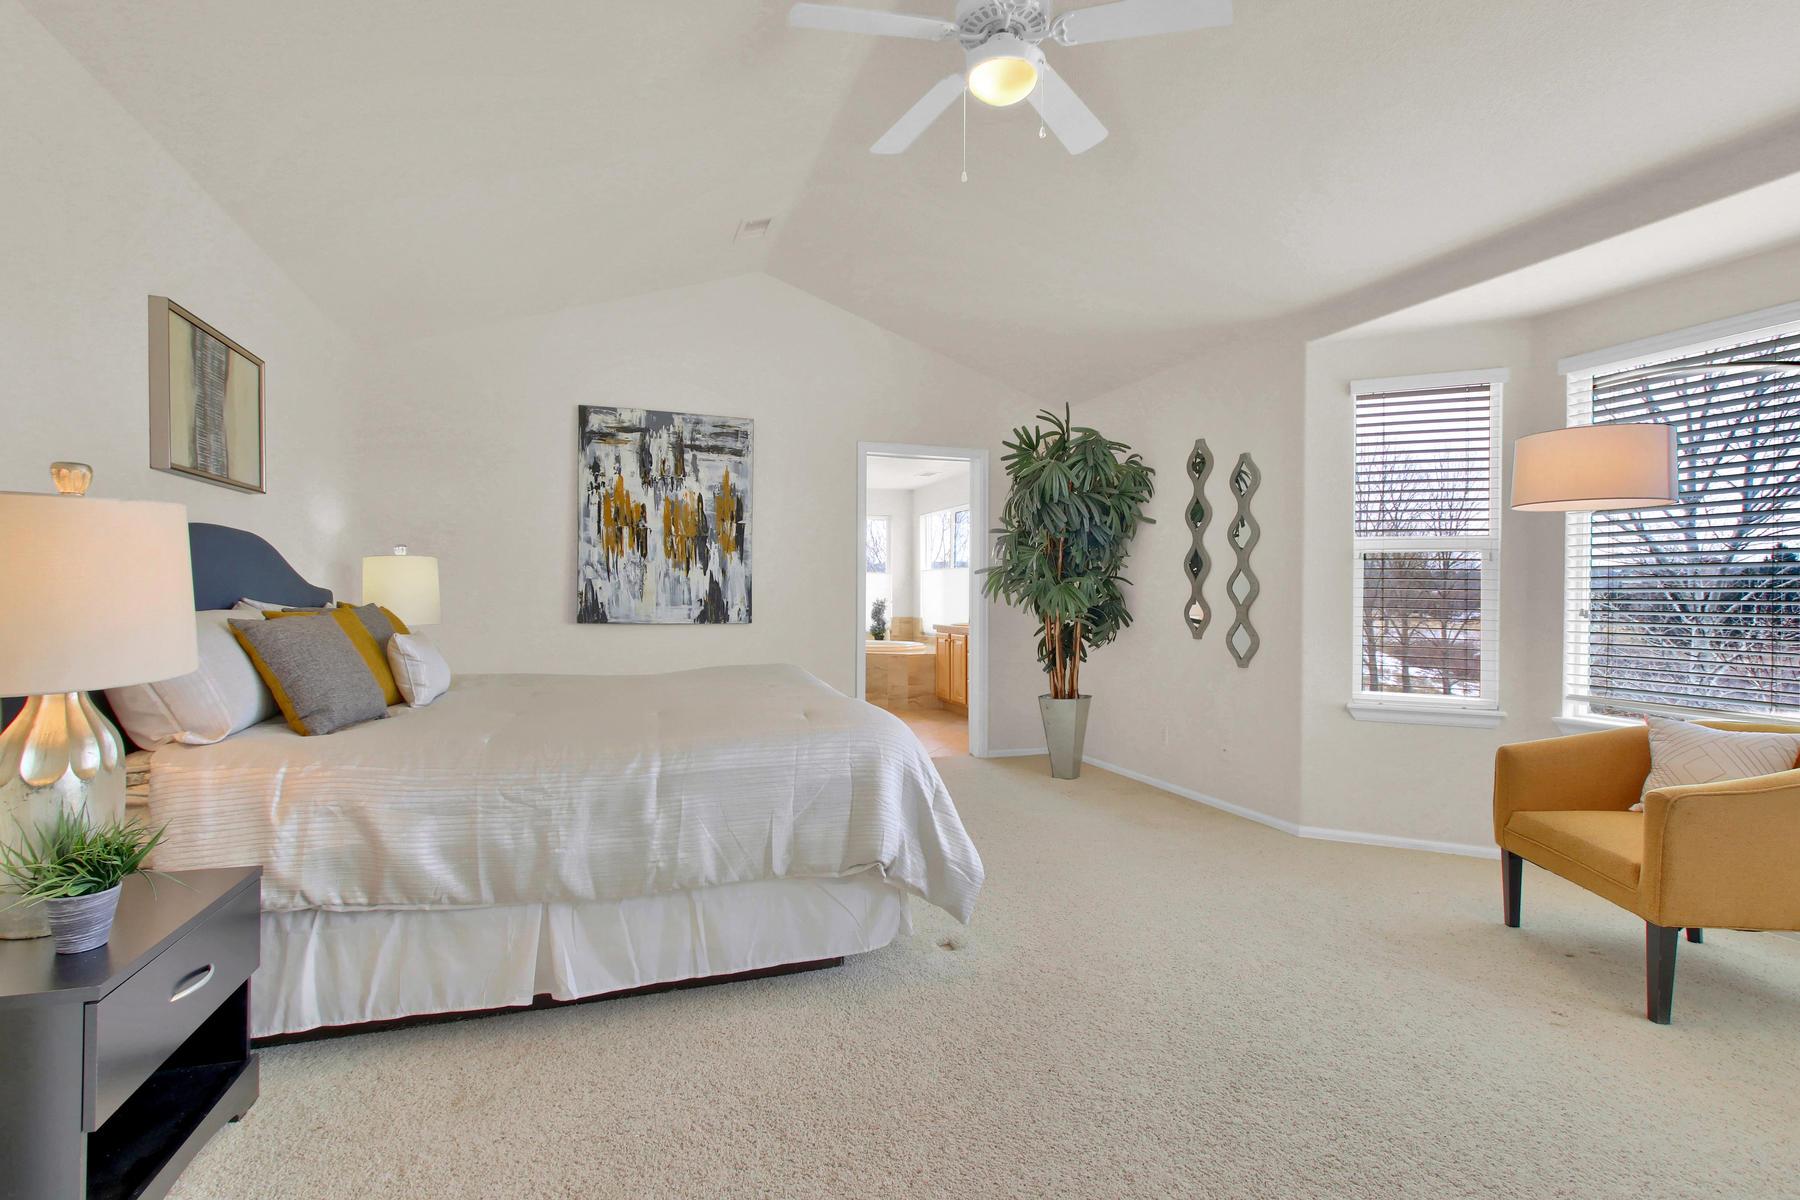 5447 Brookside Dr Broomfield-035-25-Bedroom-MLS_Size.jpg